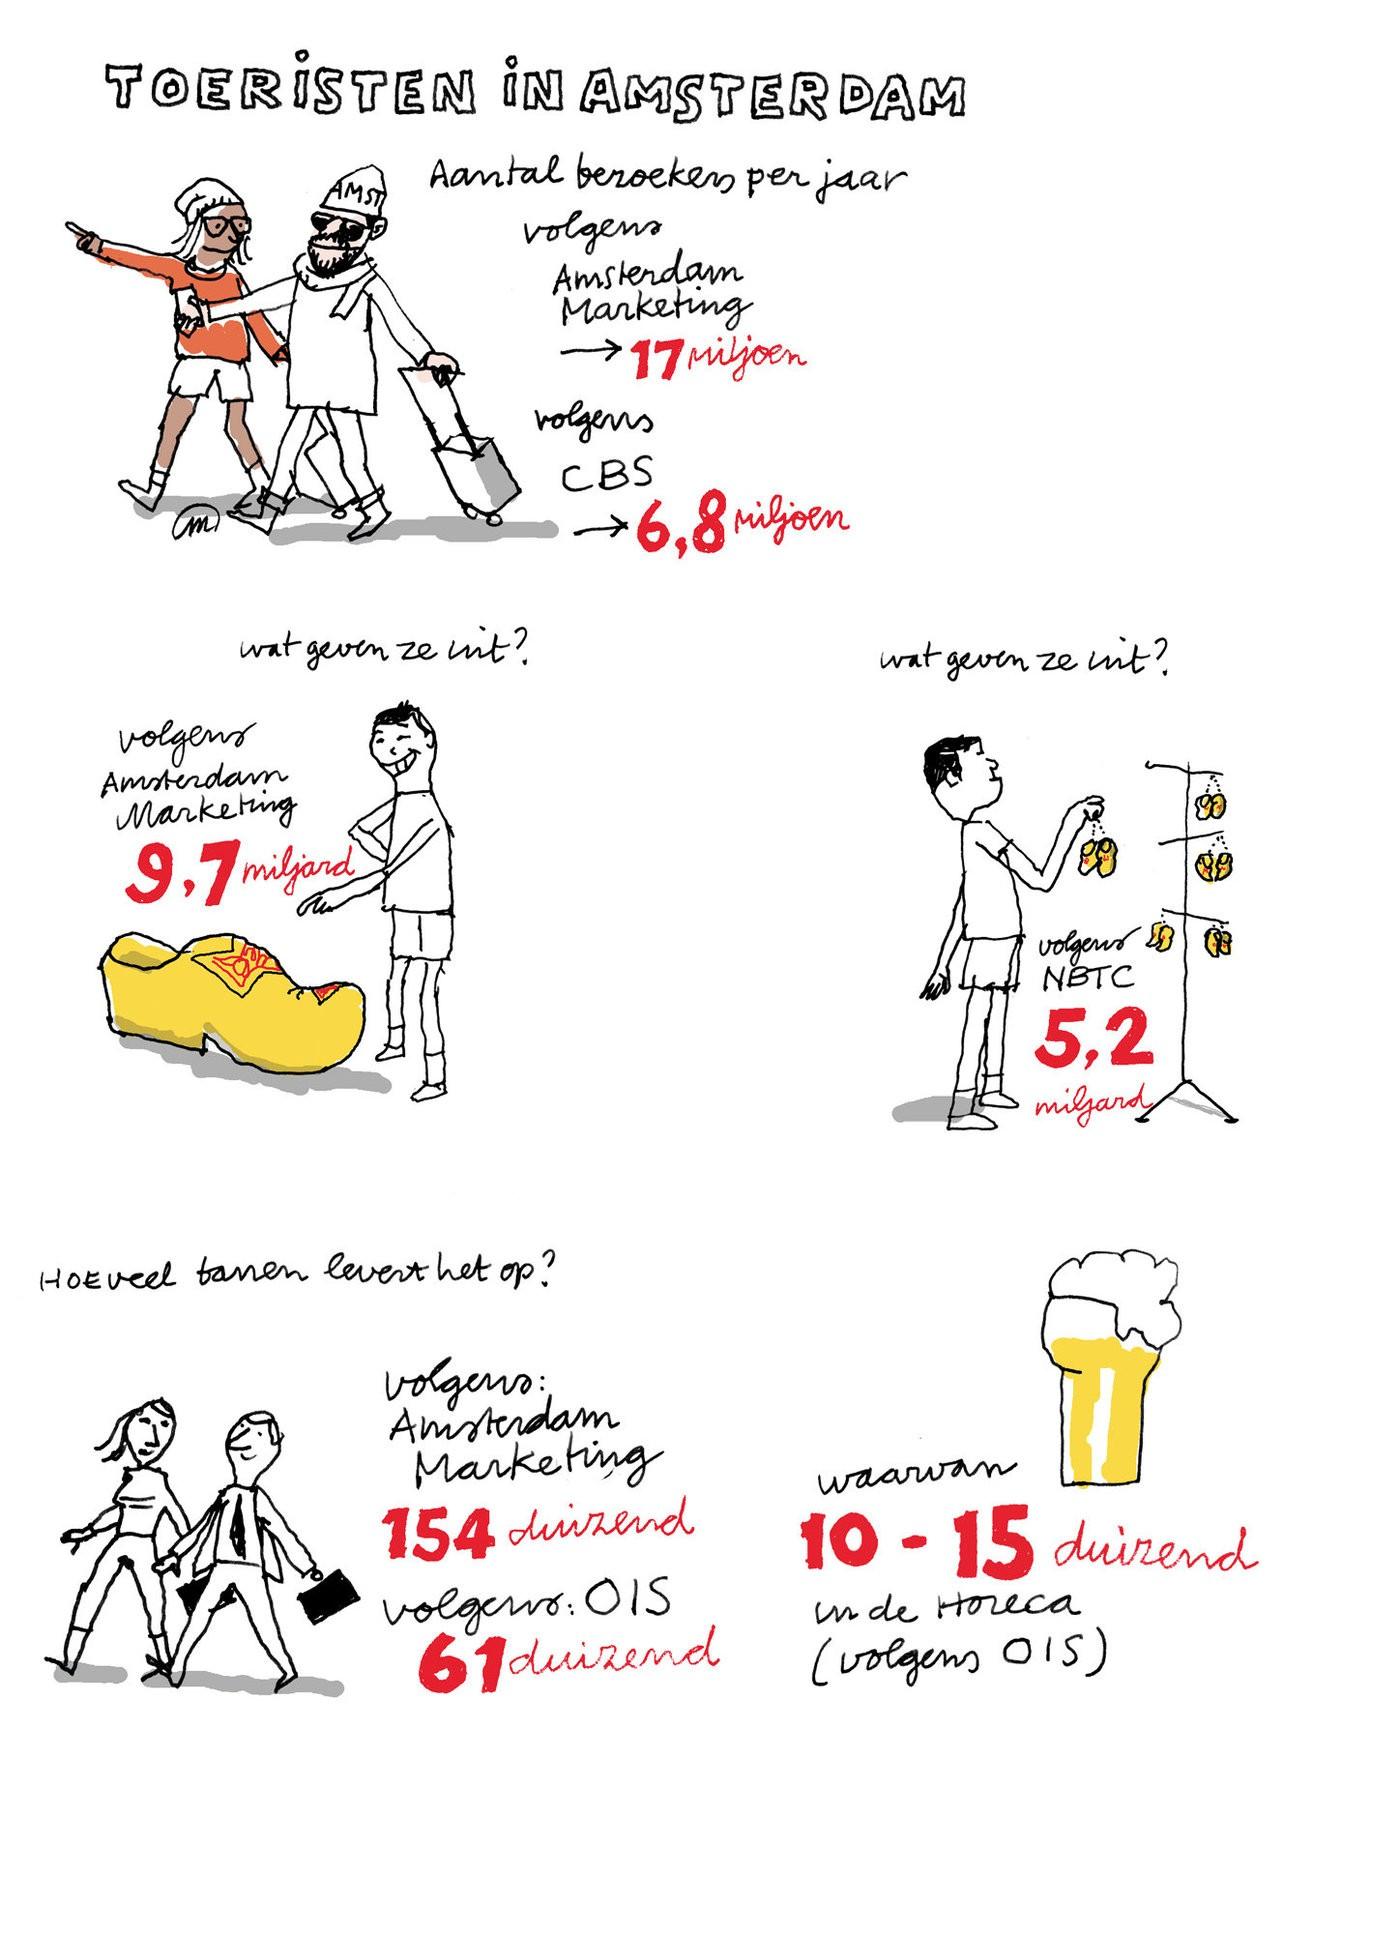 Medium cijfers toeristen in amsterdam